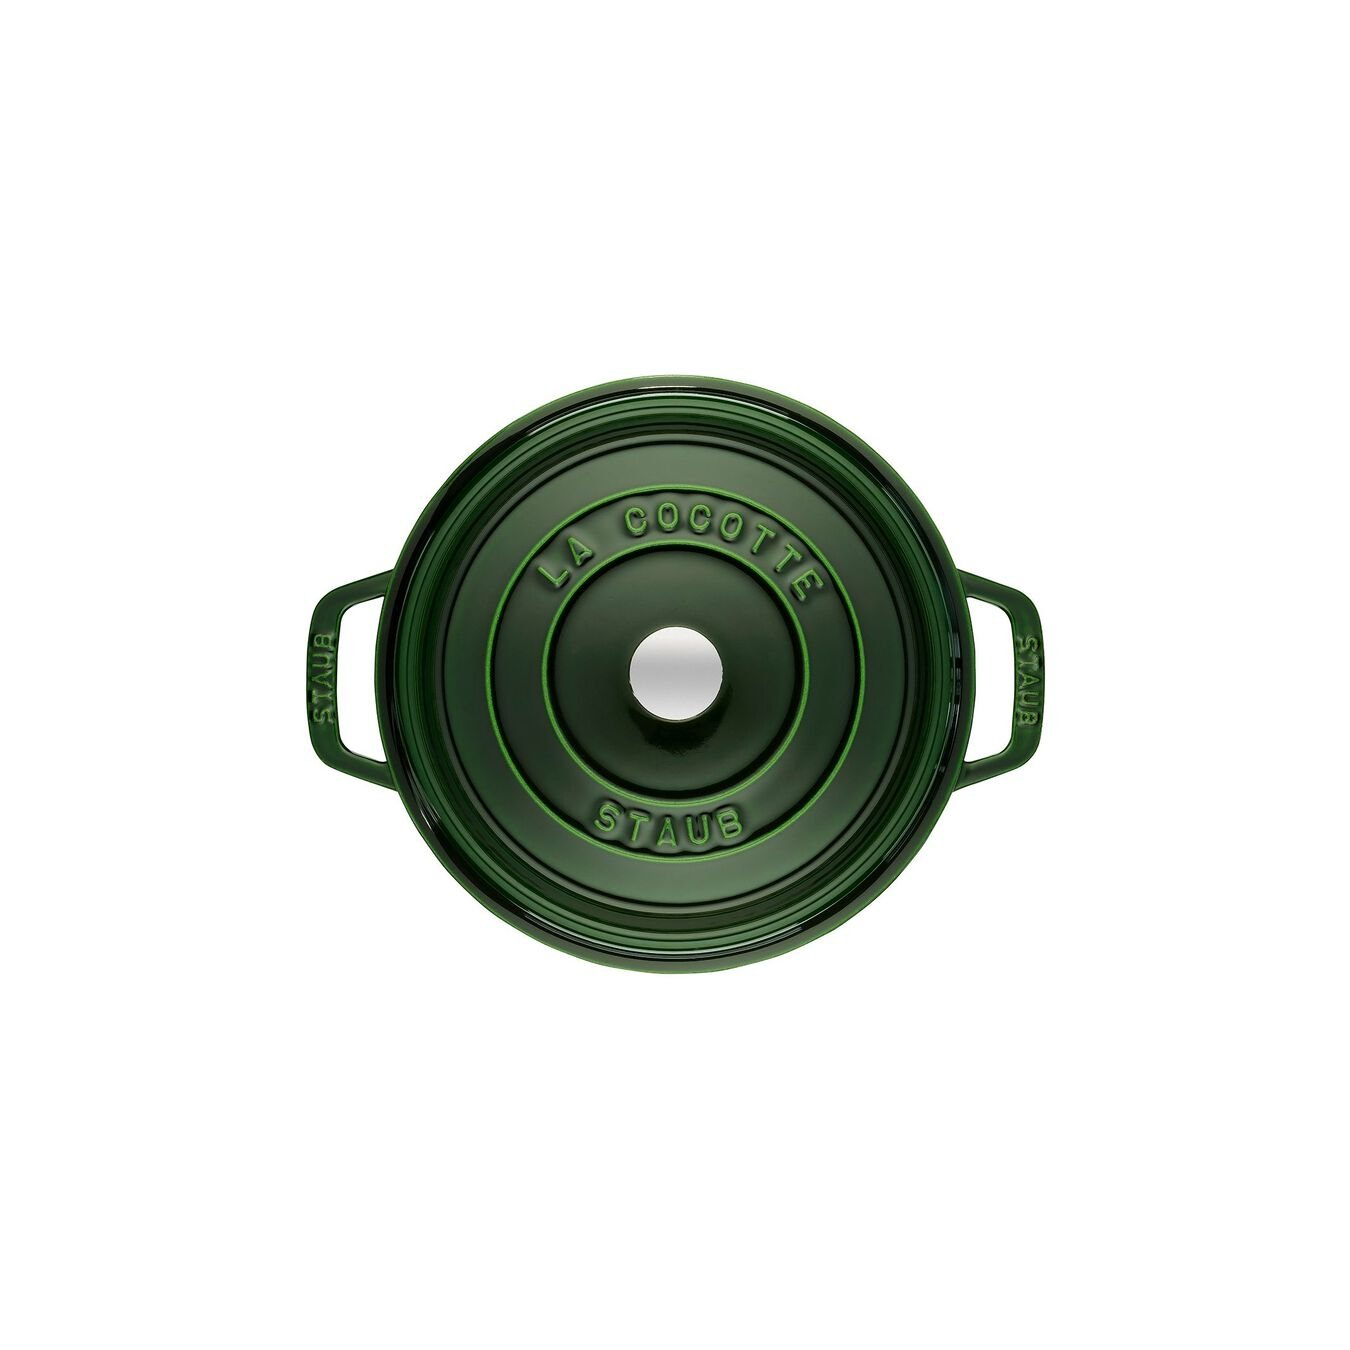 Döküm Tencere | Fesleğen | 24 cm | 3,8 l | yuvarlak,,large 2